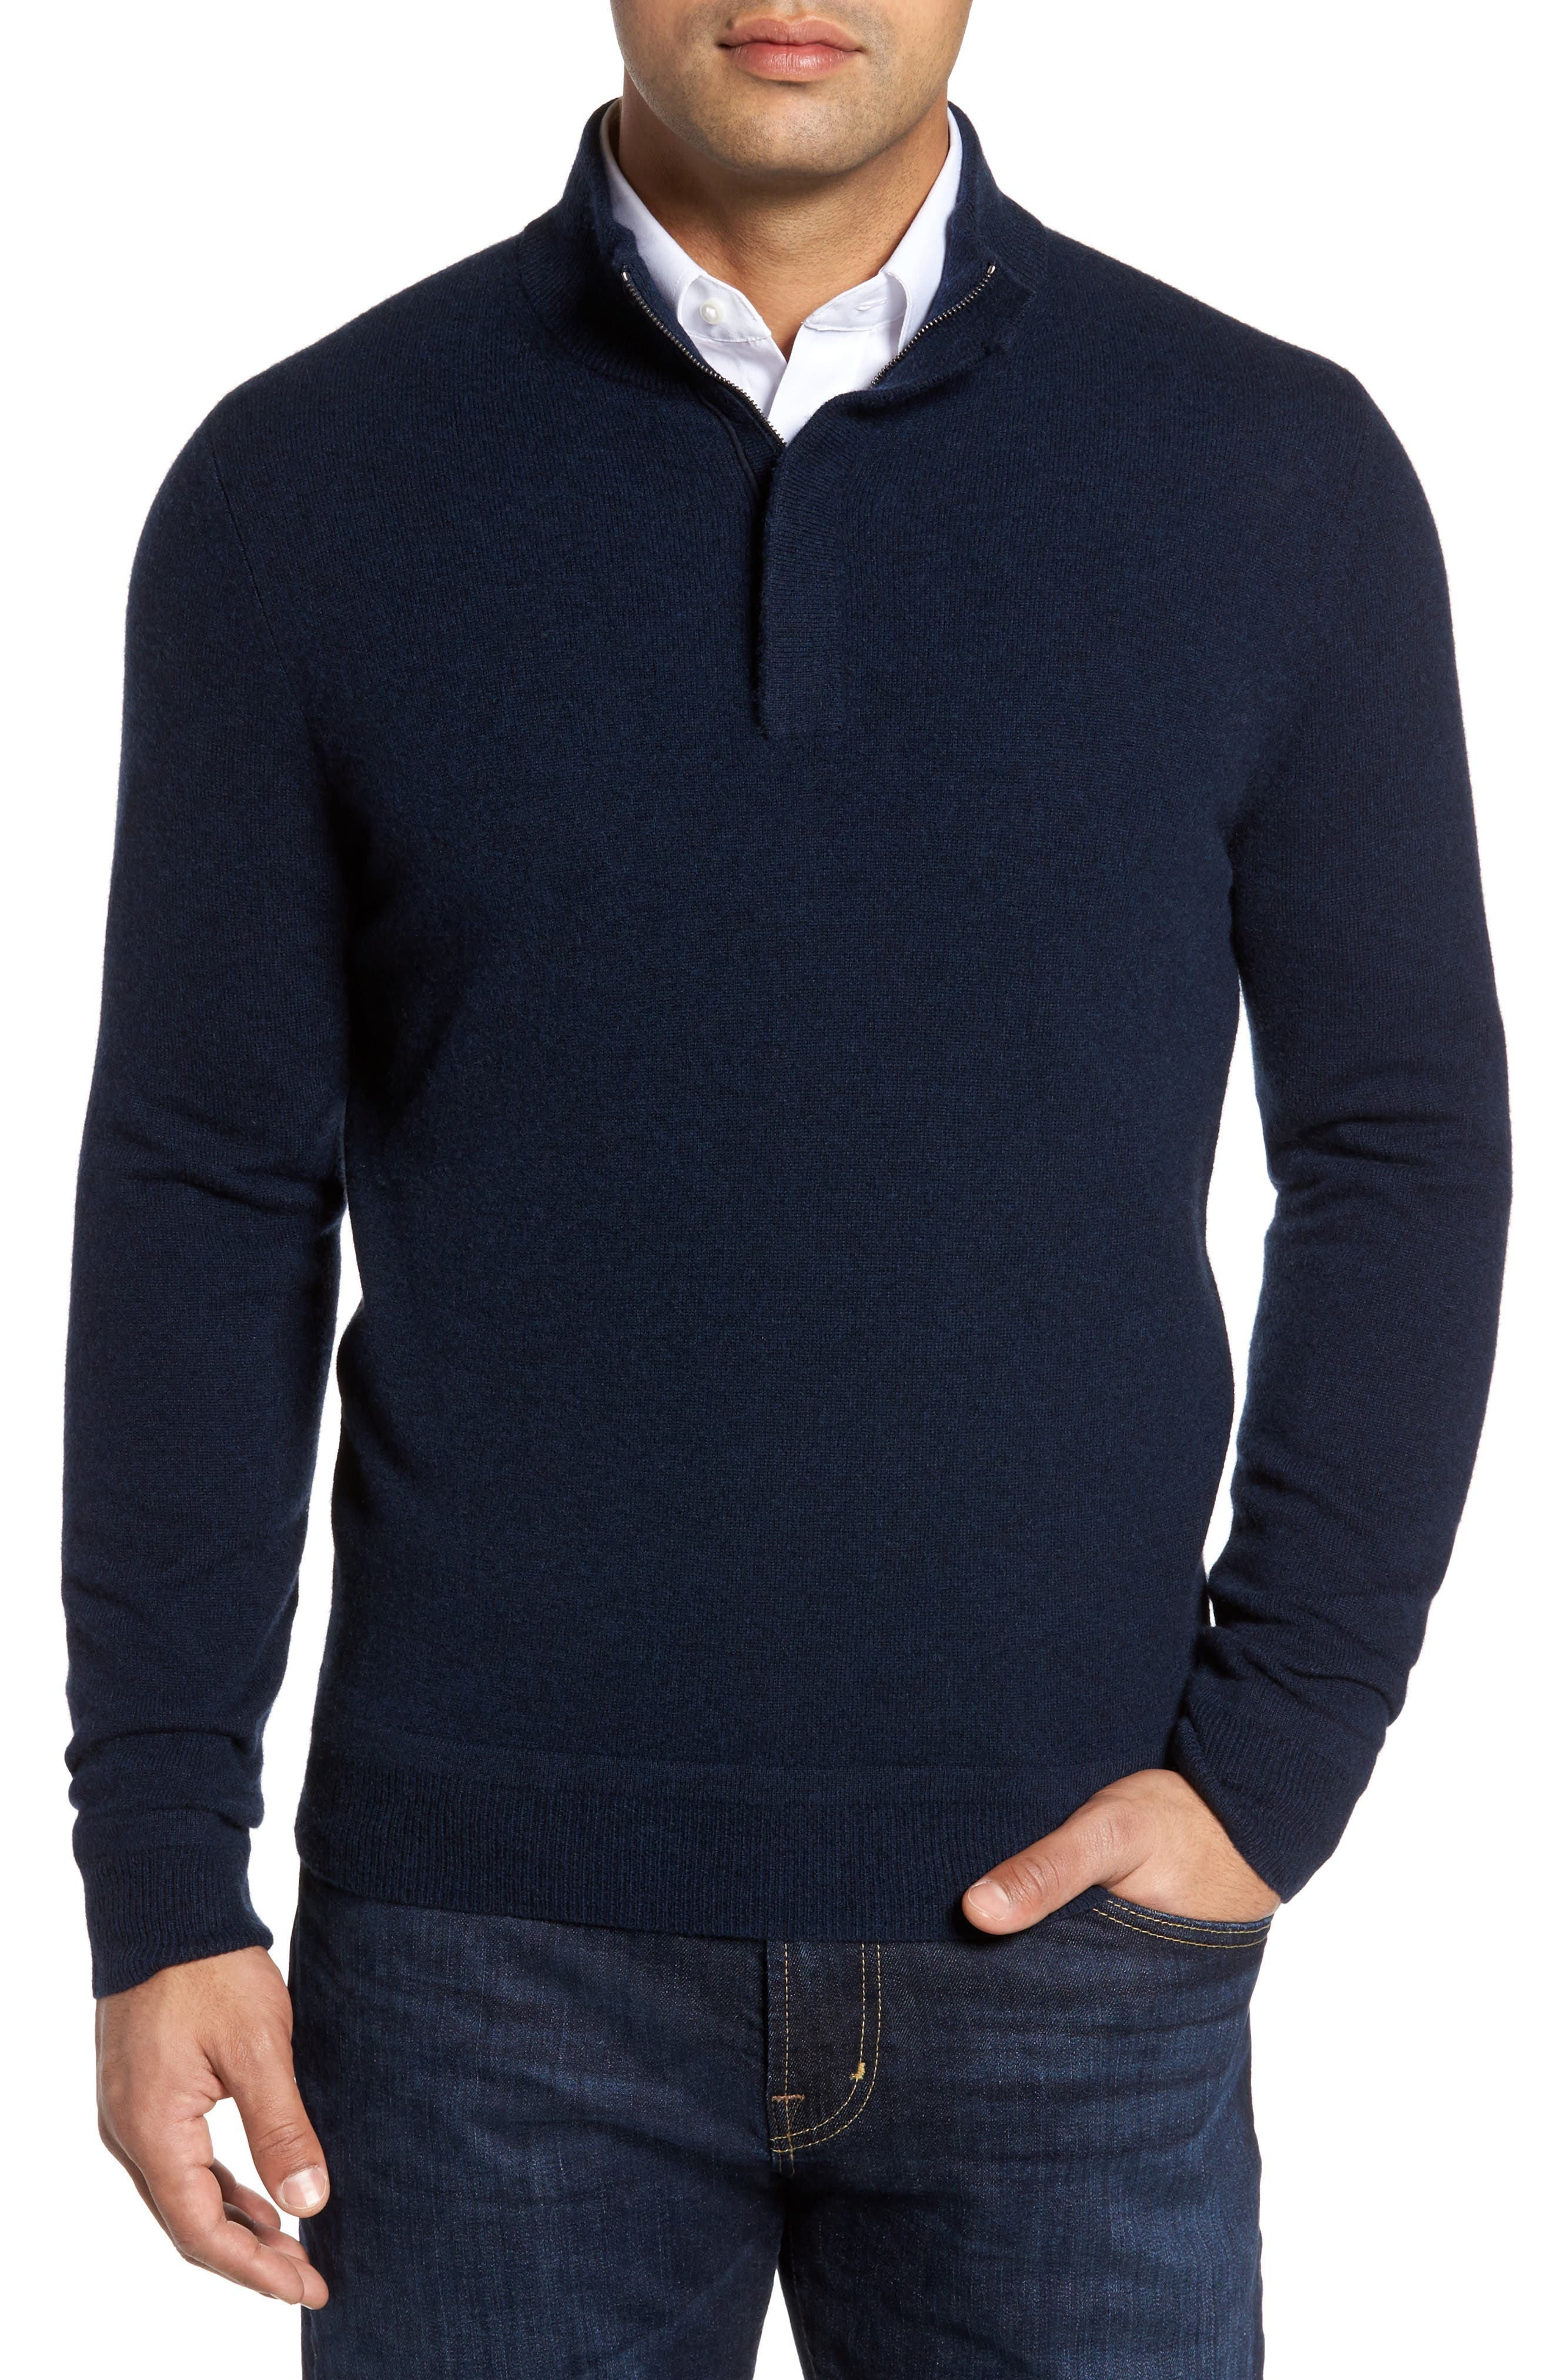 Monte Rosso Cashmere Quarter Zip Sweater